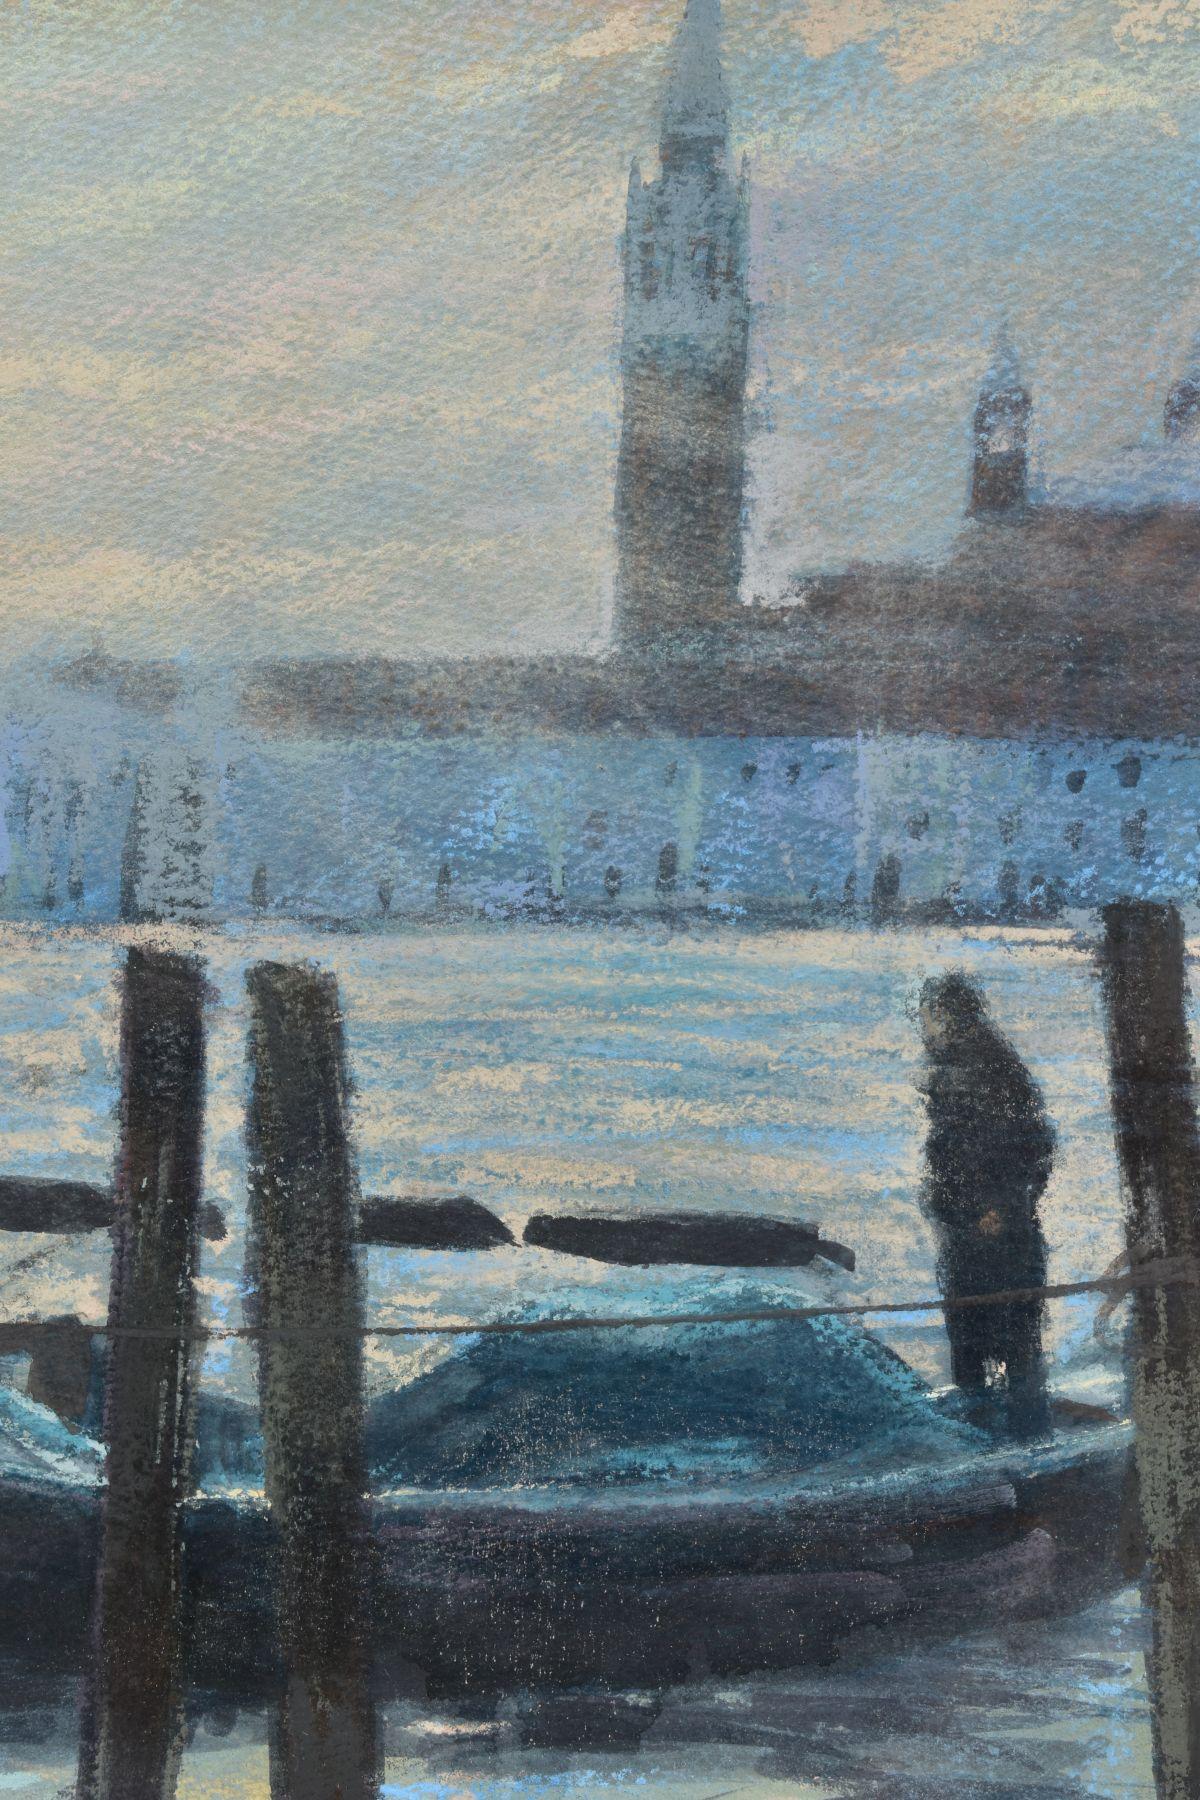 JAMES BARTHOLOMEW (BRITISH CONTEMPORARY), 'Towards San Giorgio, First Light', a Venetian scene - Image 3 of 7